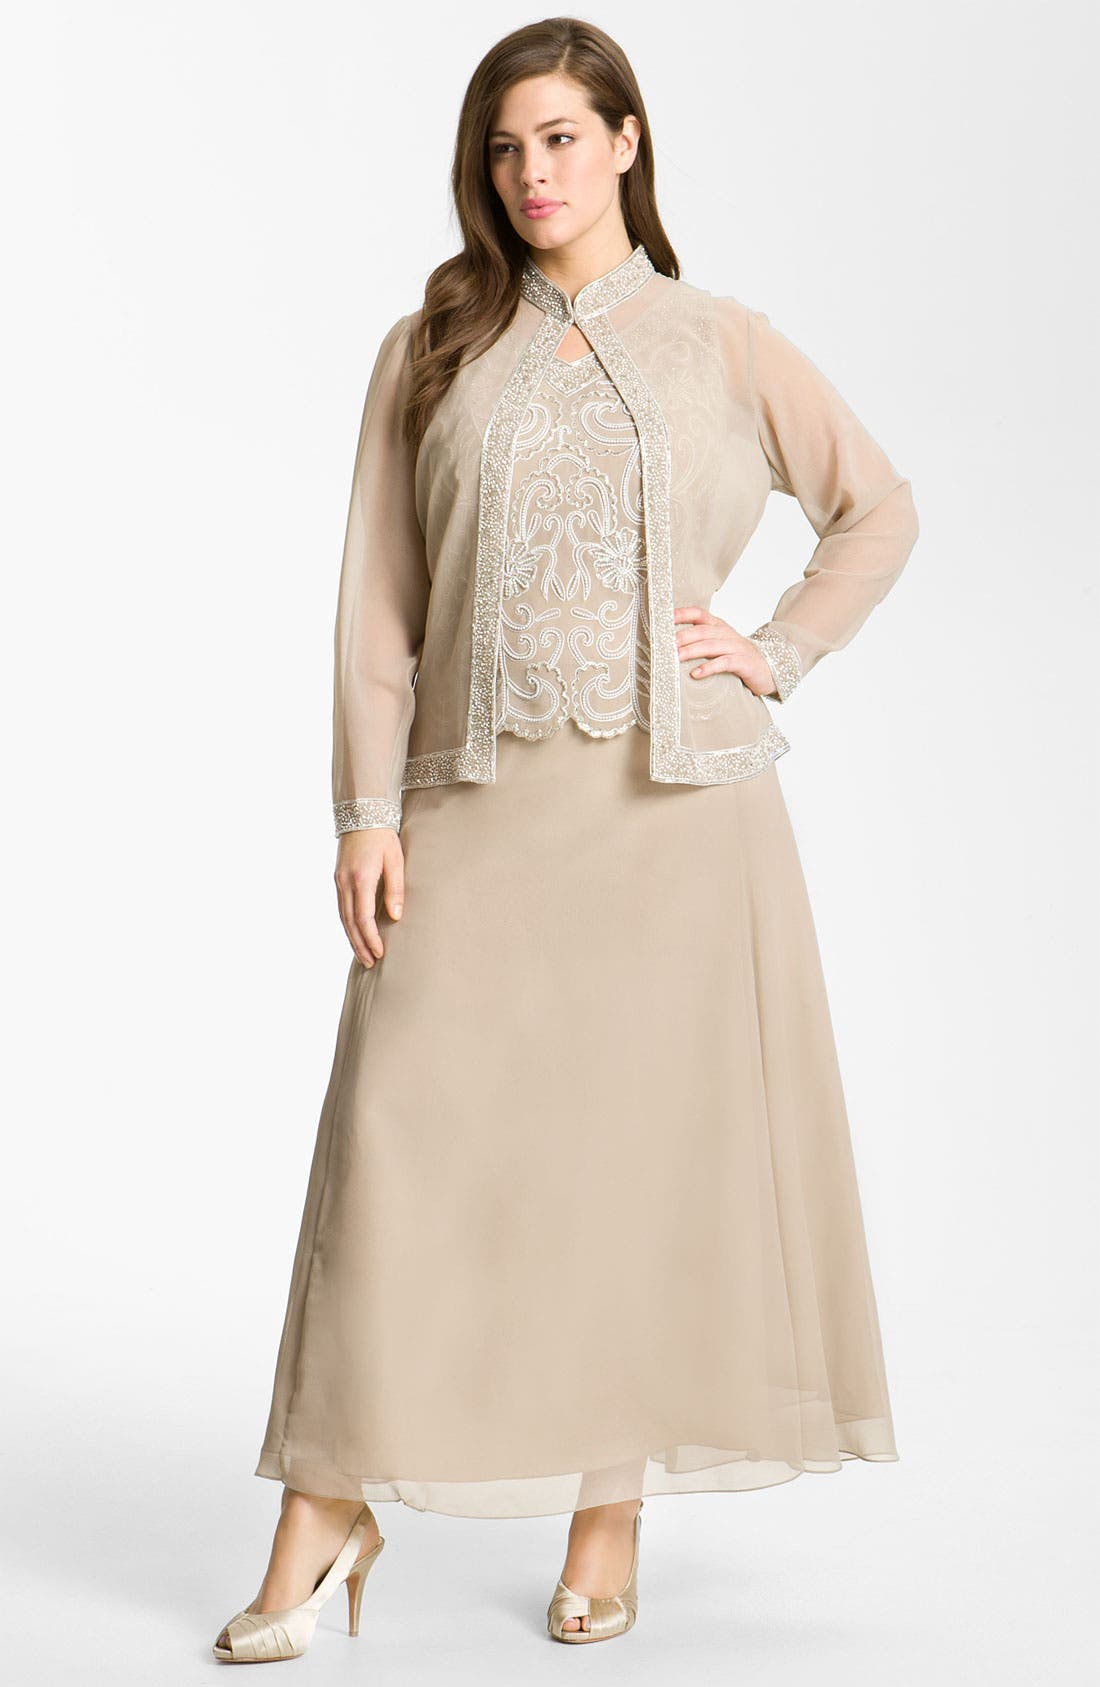 Alternate Image 1 Selected - J Kara Sheer Beaded Chiffon Gown & Jacket (Plus)